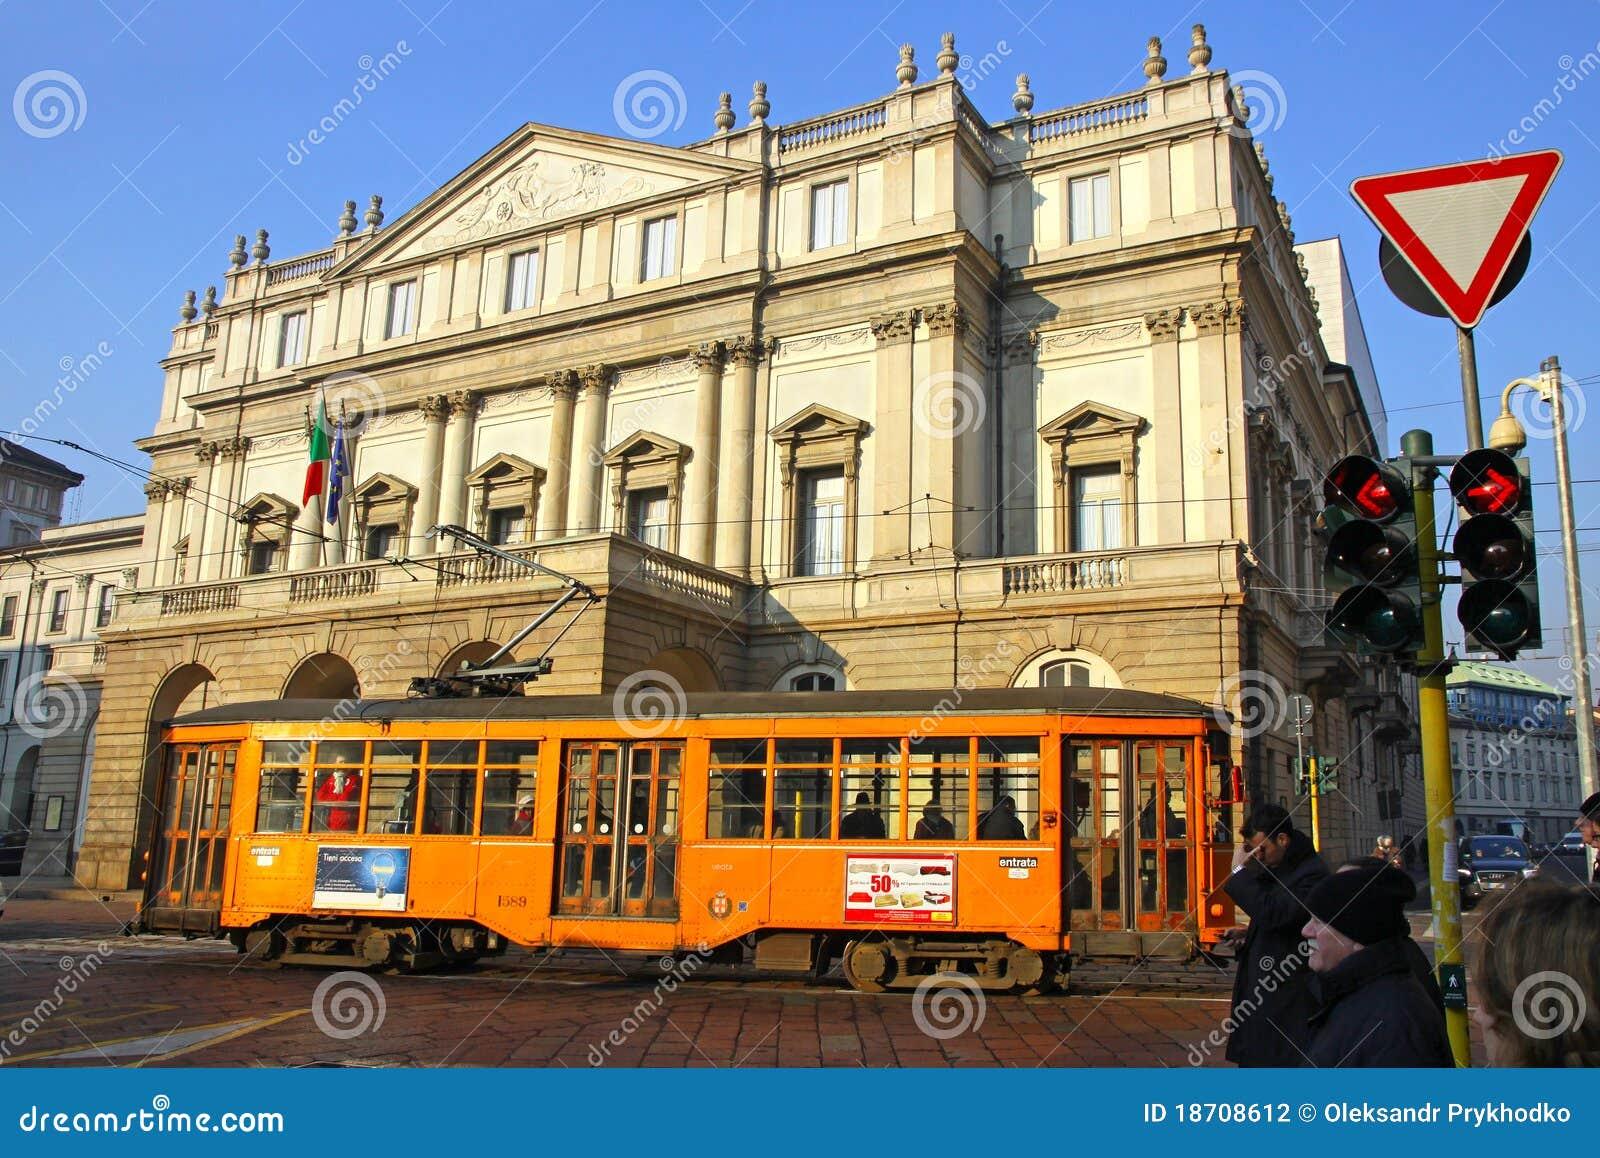 La Scala Theater in Milan